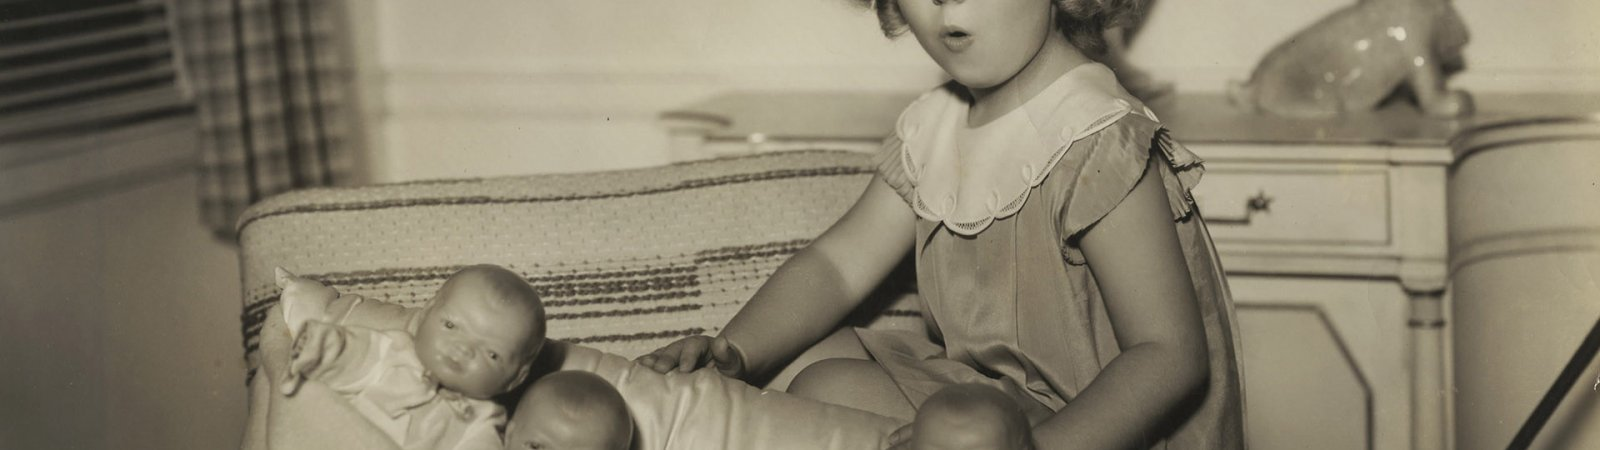 Photo dernier film Therese Dorny